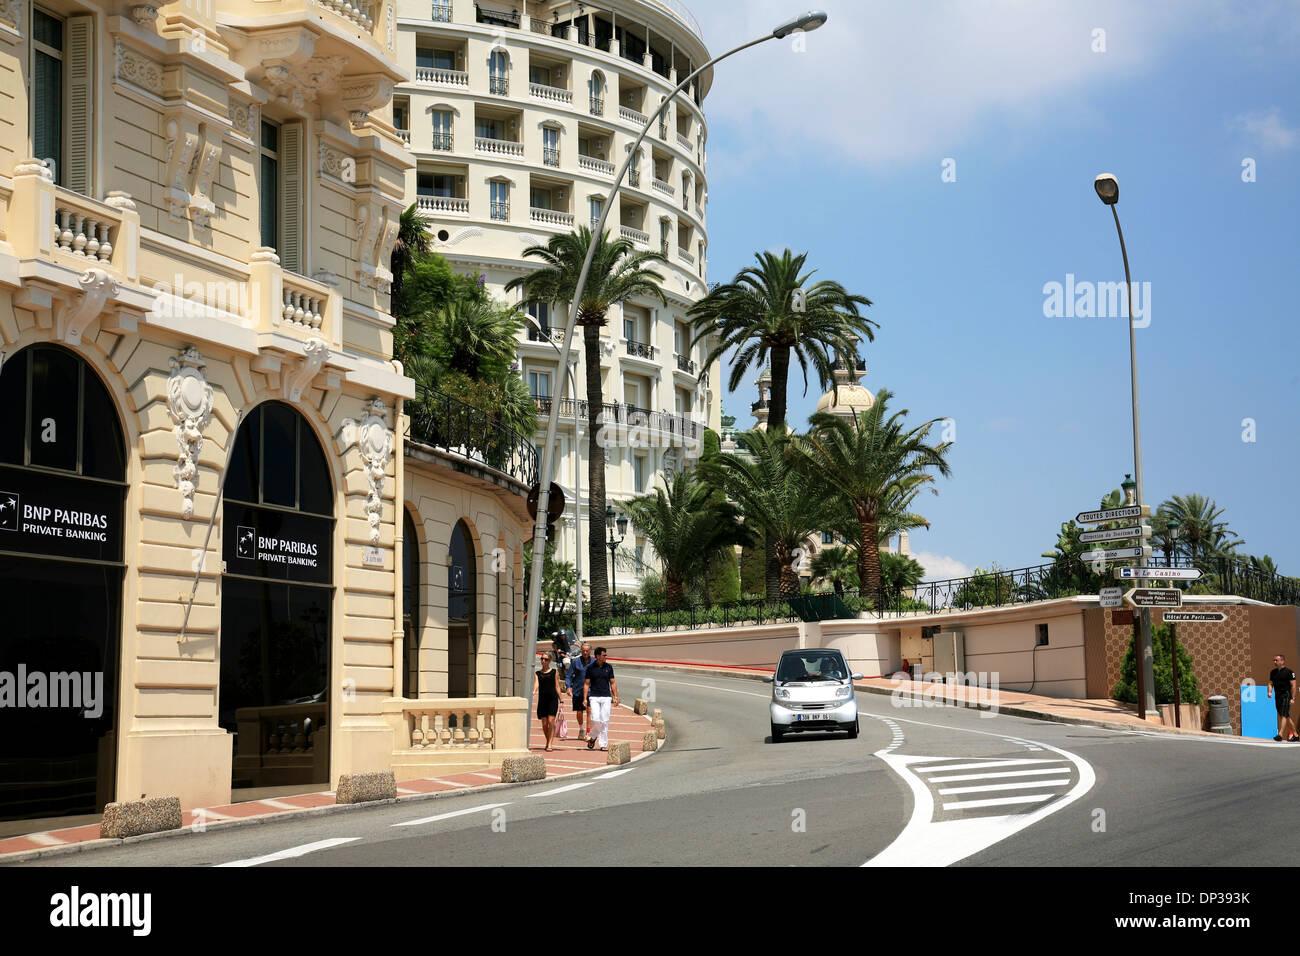 MONACO, MONTE CARLO - JULY 07, 2008: Second turn Formula 1 race from Avenue d'Ostende to Avenue Princesse Alice. - Stock Image